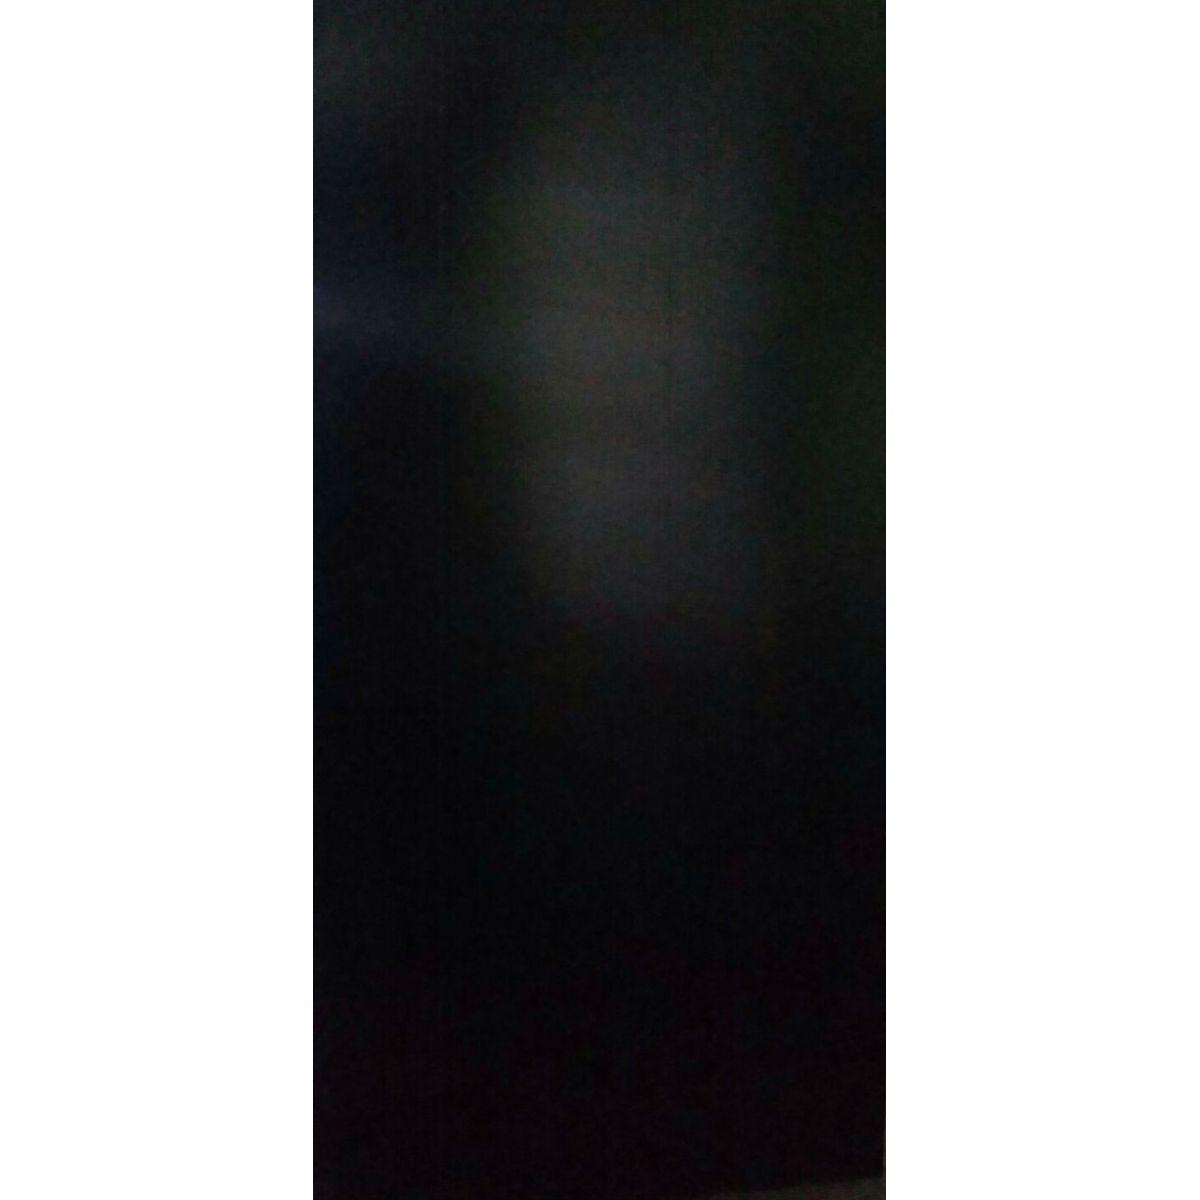 Prancha Deck Esteira Ergométrica Embreex 563, 568, 800 AL0/AL1